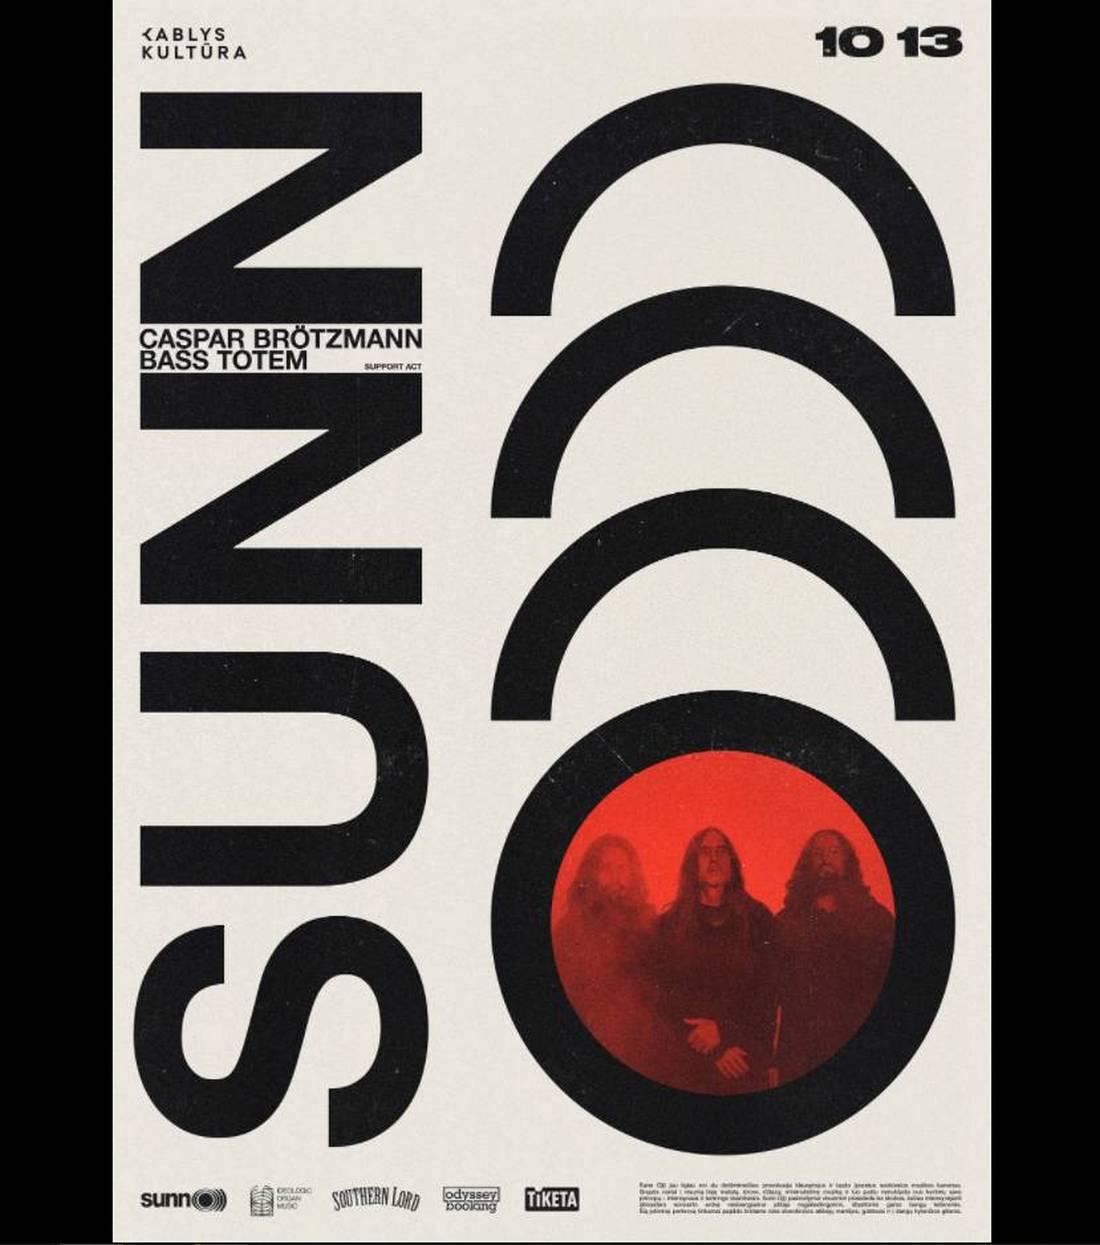 sun o band poster